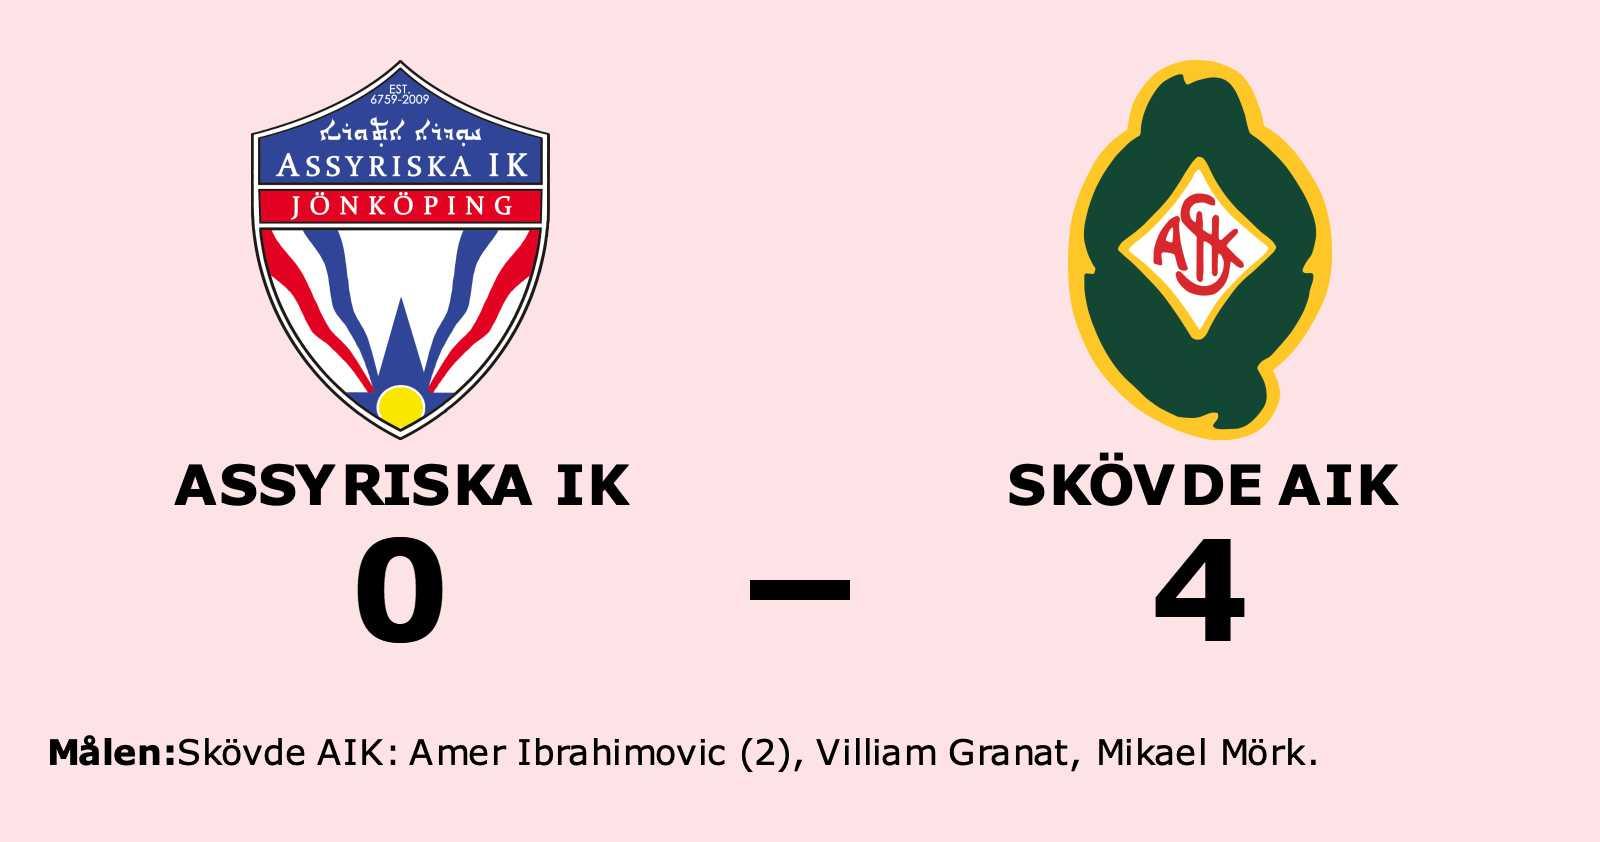 Amer Ibrahimovic i målform när Skövde AIK vann